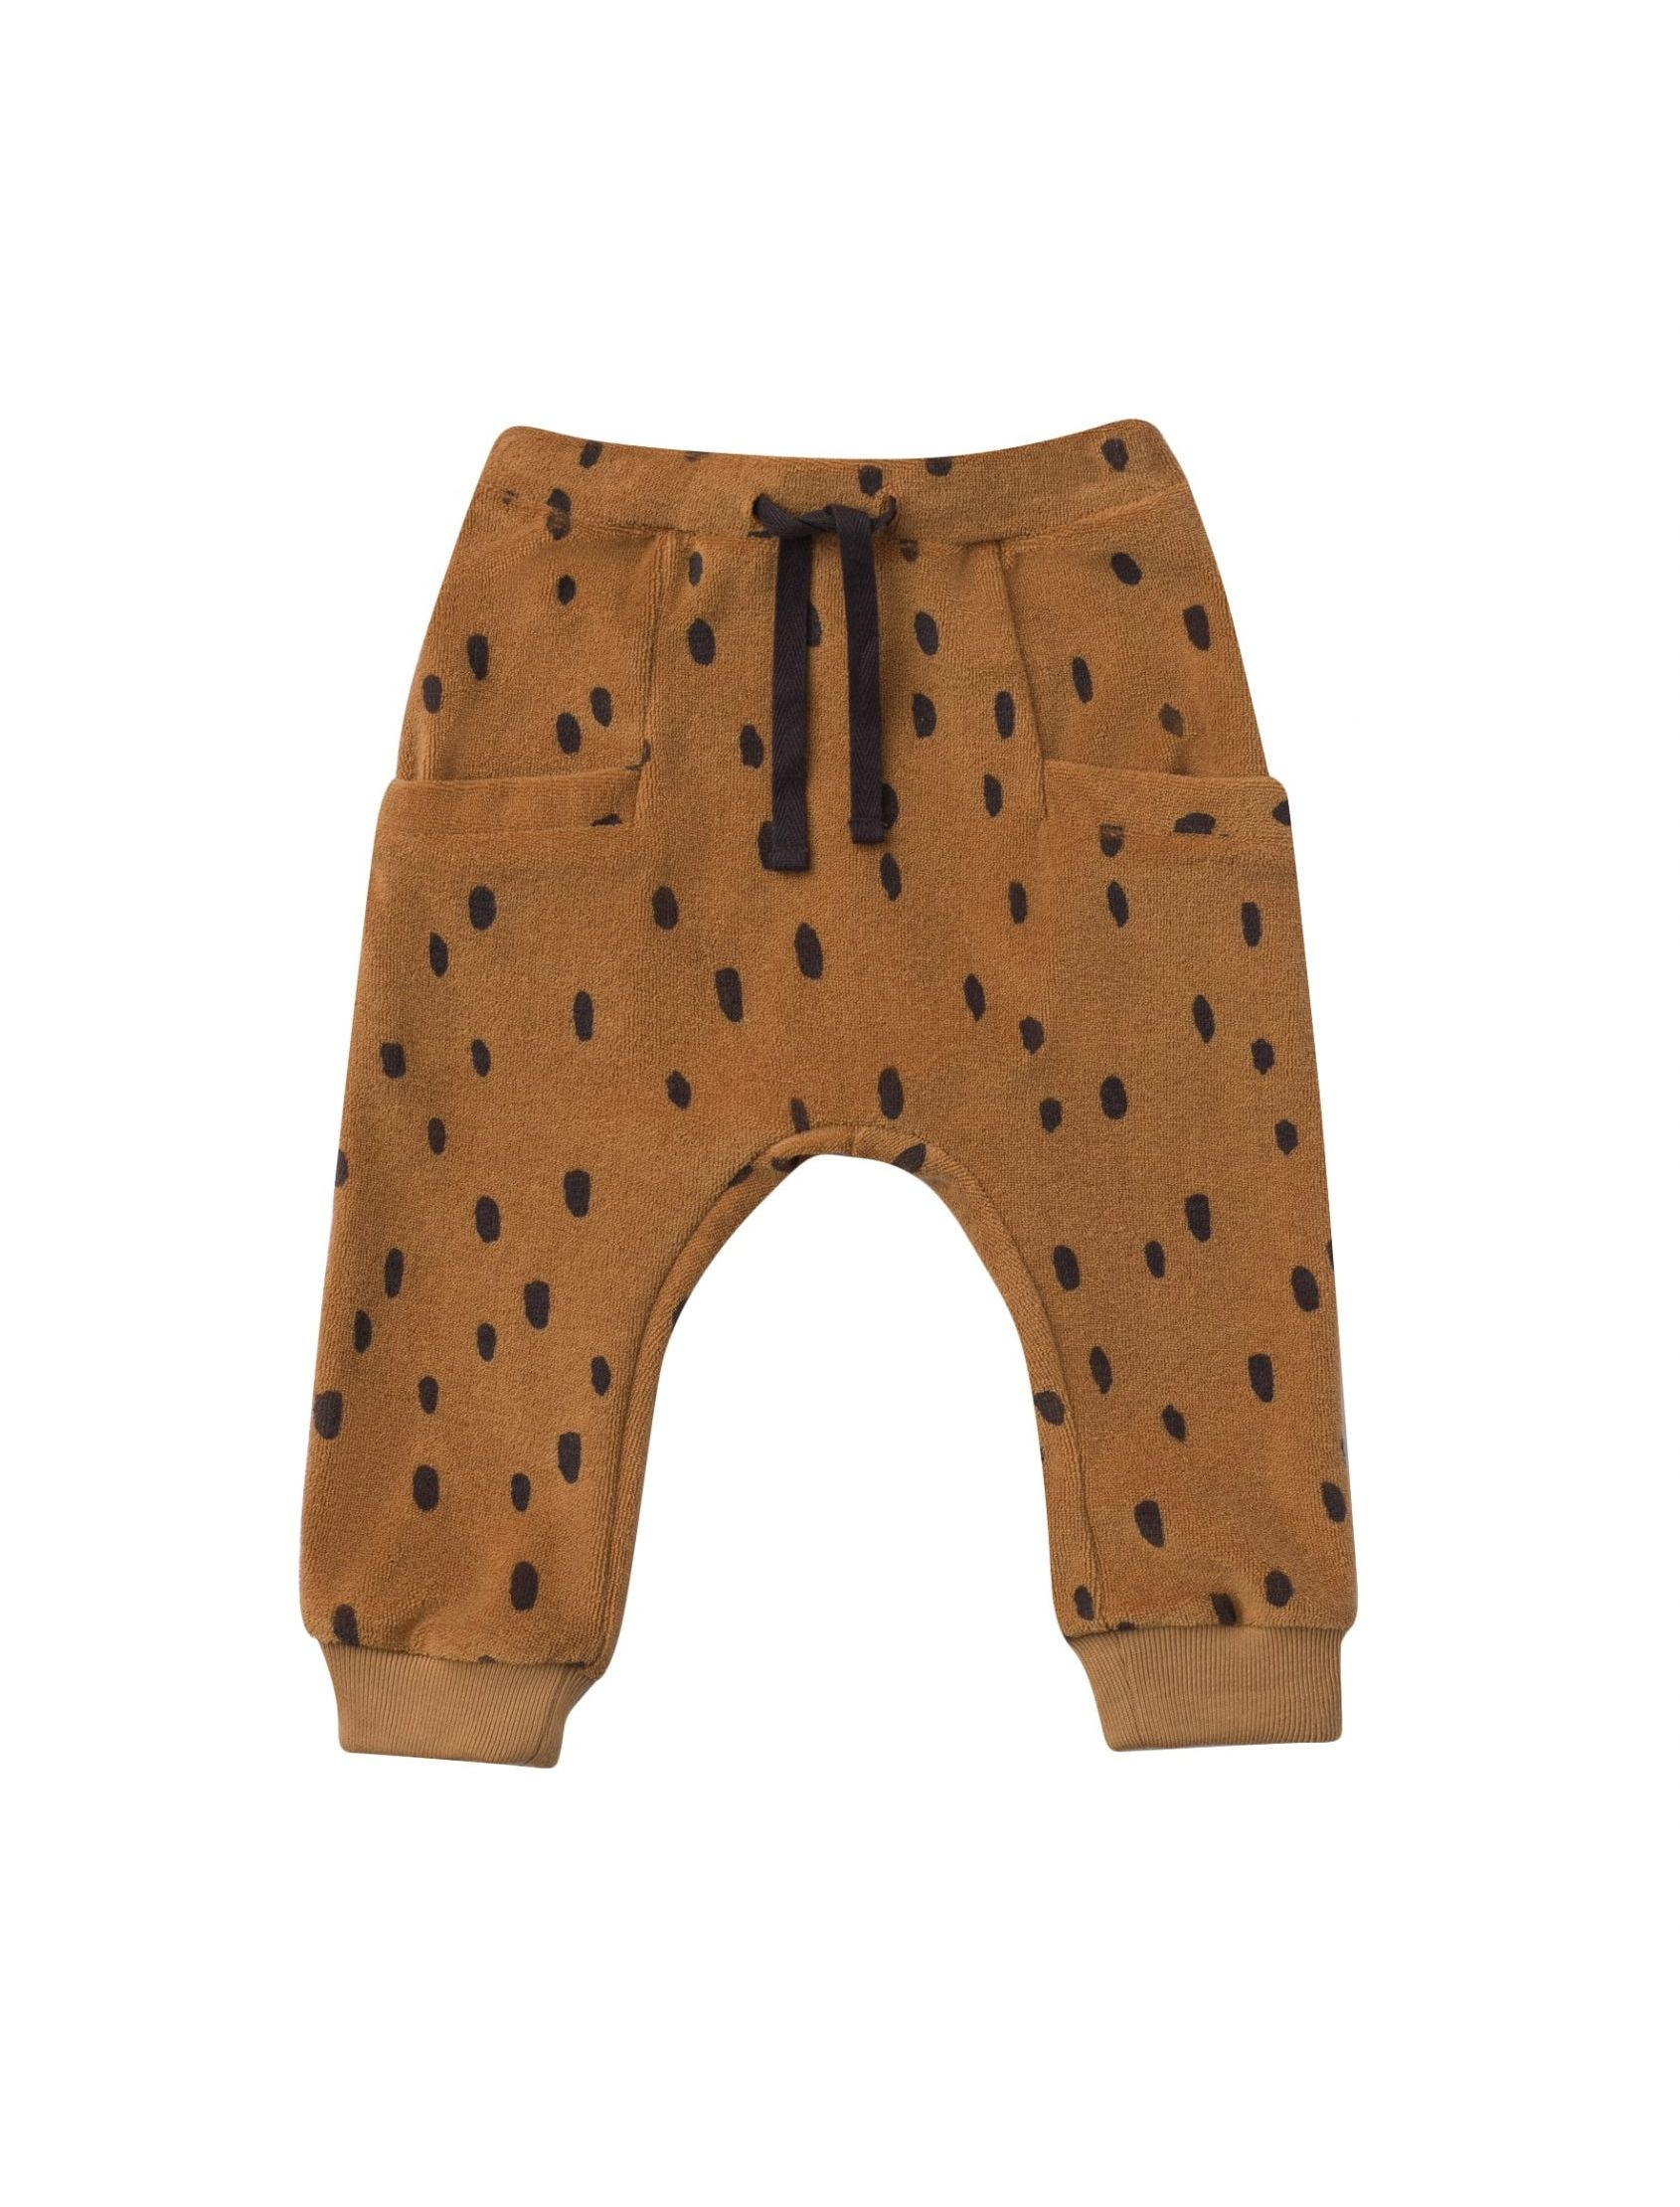 Pantalon Spots rust Baby Clic_Mamalua_01